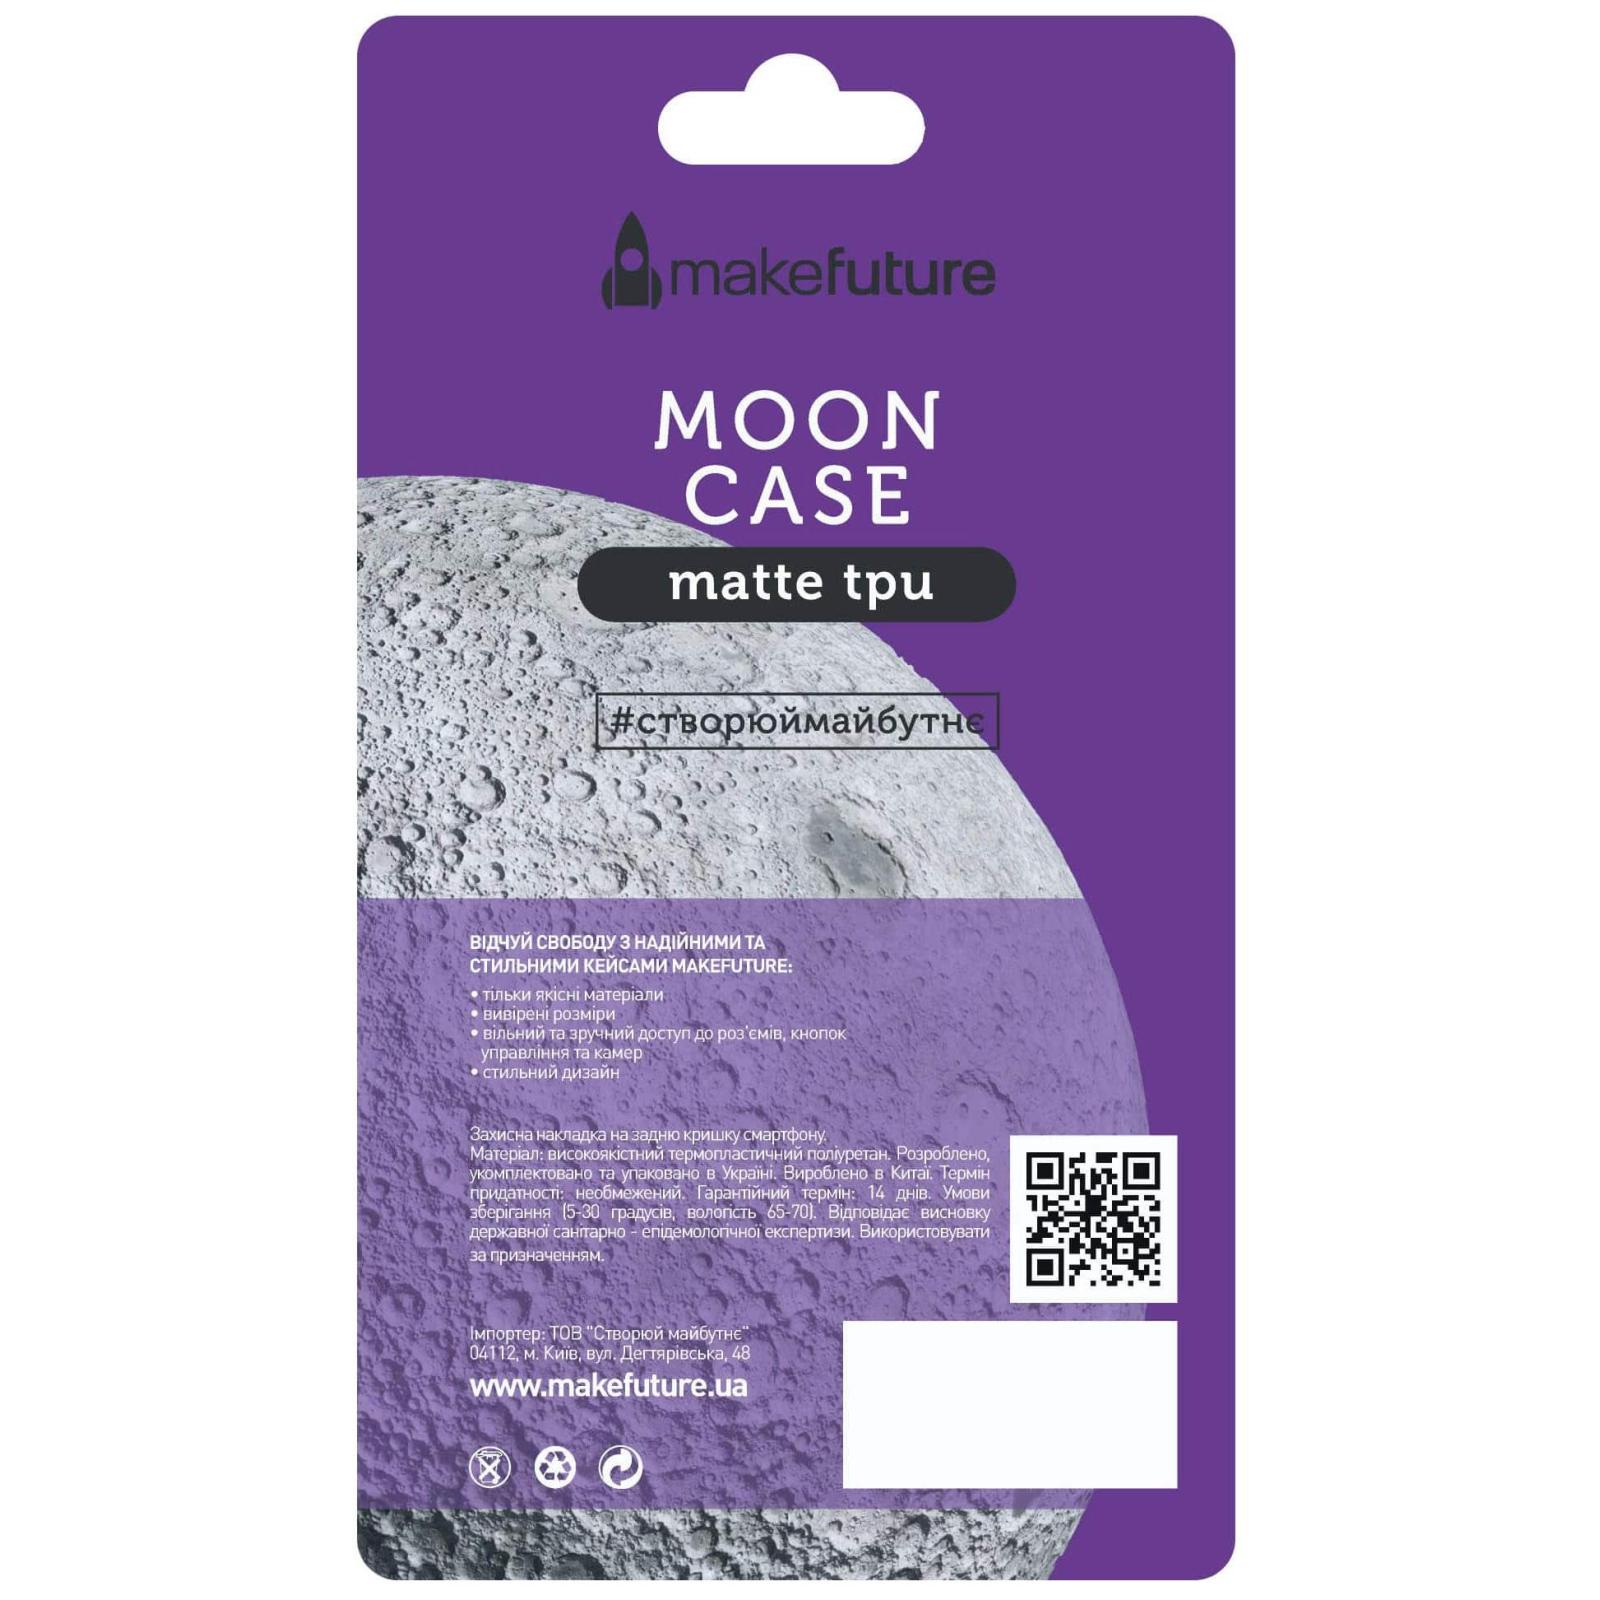 Чехол для моб. телефона MakeFuture Moon Case (TPU) для Samsung J3 2017 (J330) Blue (MCM-SJ330BL) изображение 5